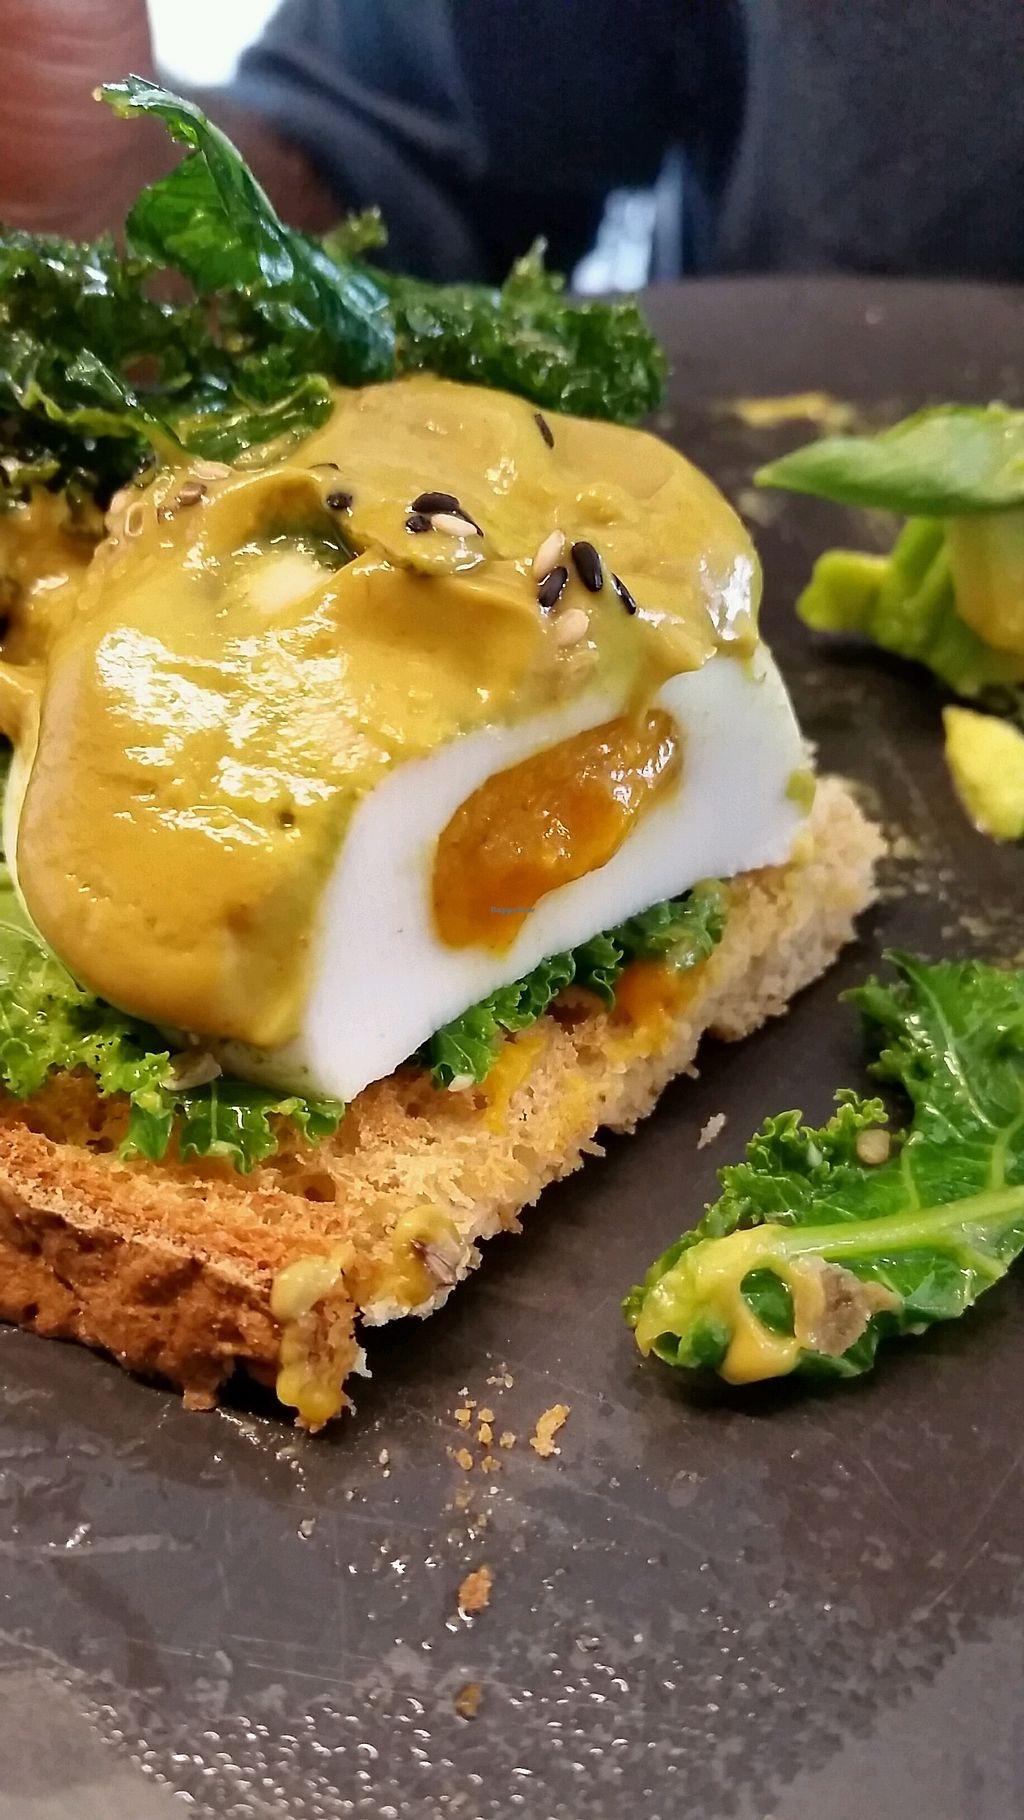 "Photo of Matcha Mylkbar  by <a href=""/members/profile/emmawestrup"">emmawestrup</a> <br/>Hollandaise (vegan) eggs <br/> February 25, 2018  - <a href='/contact/abuse/image/71552/363764'>Report</a>"